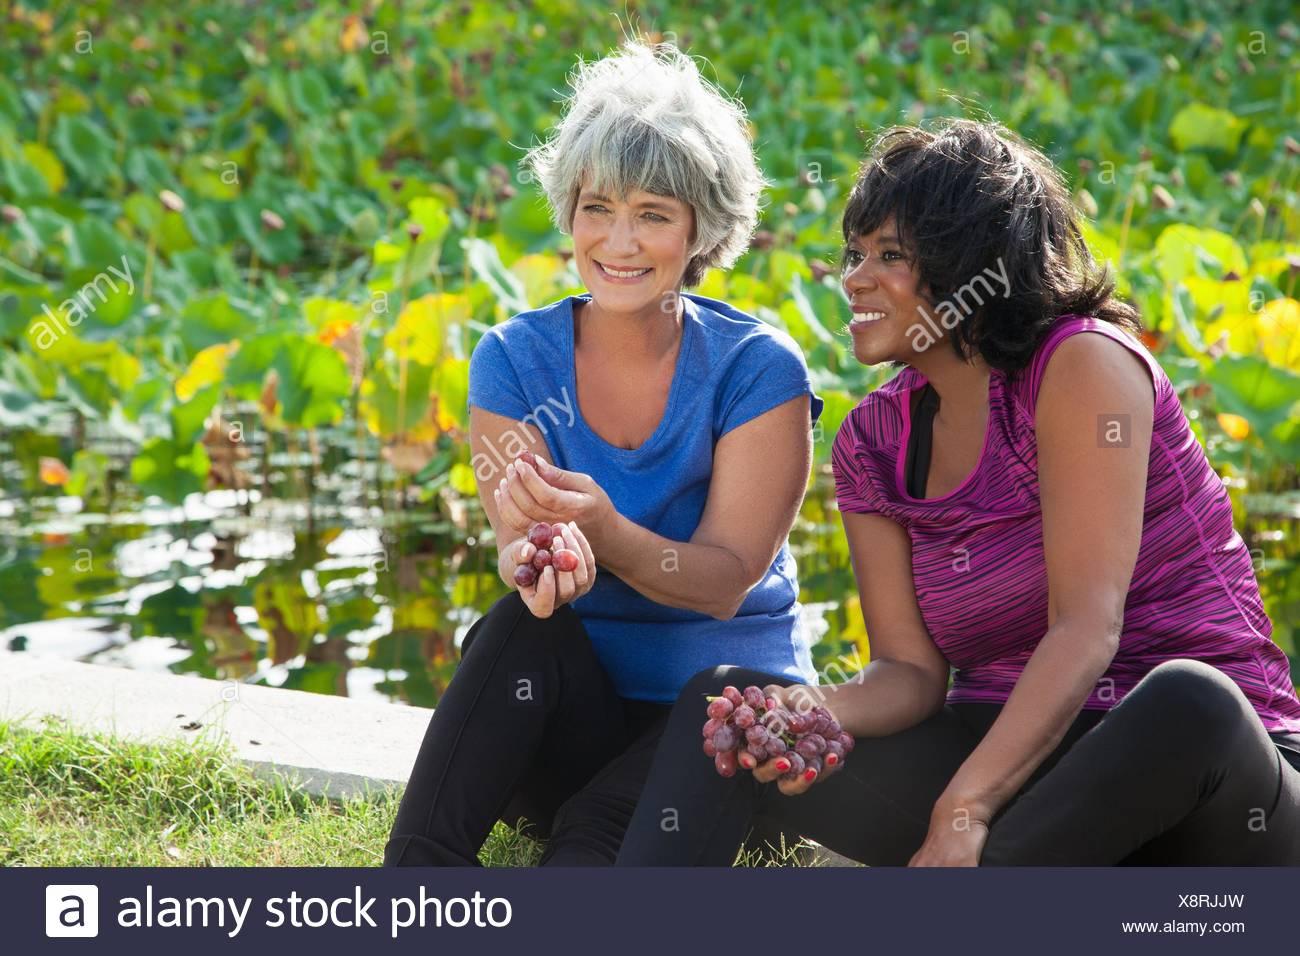 Reife Freundinnen sitzen im Park, essen Trauben Stockbild